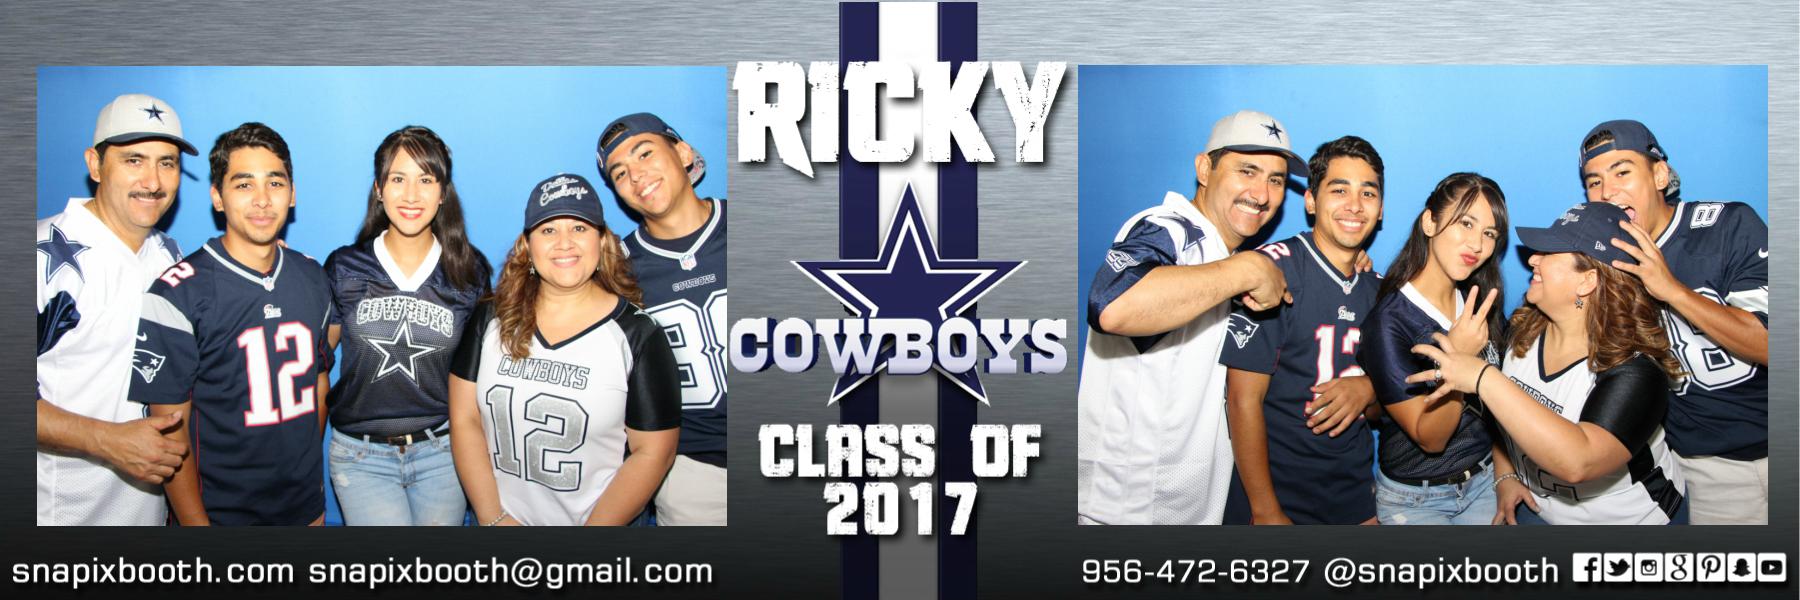 Ricky's Graduation Party